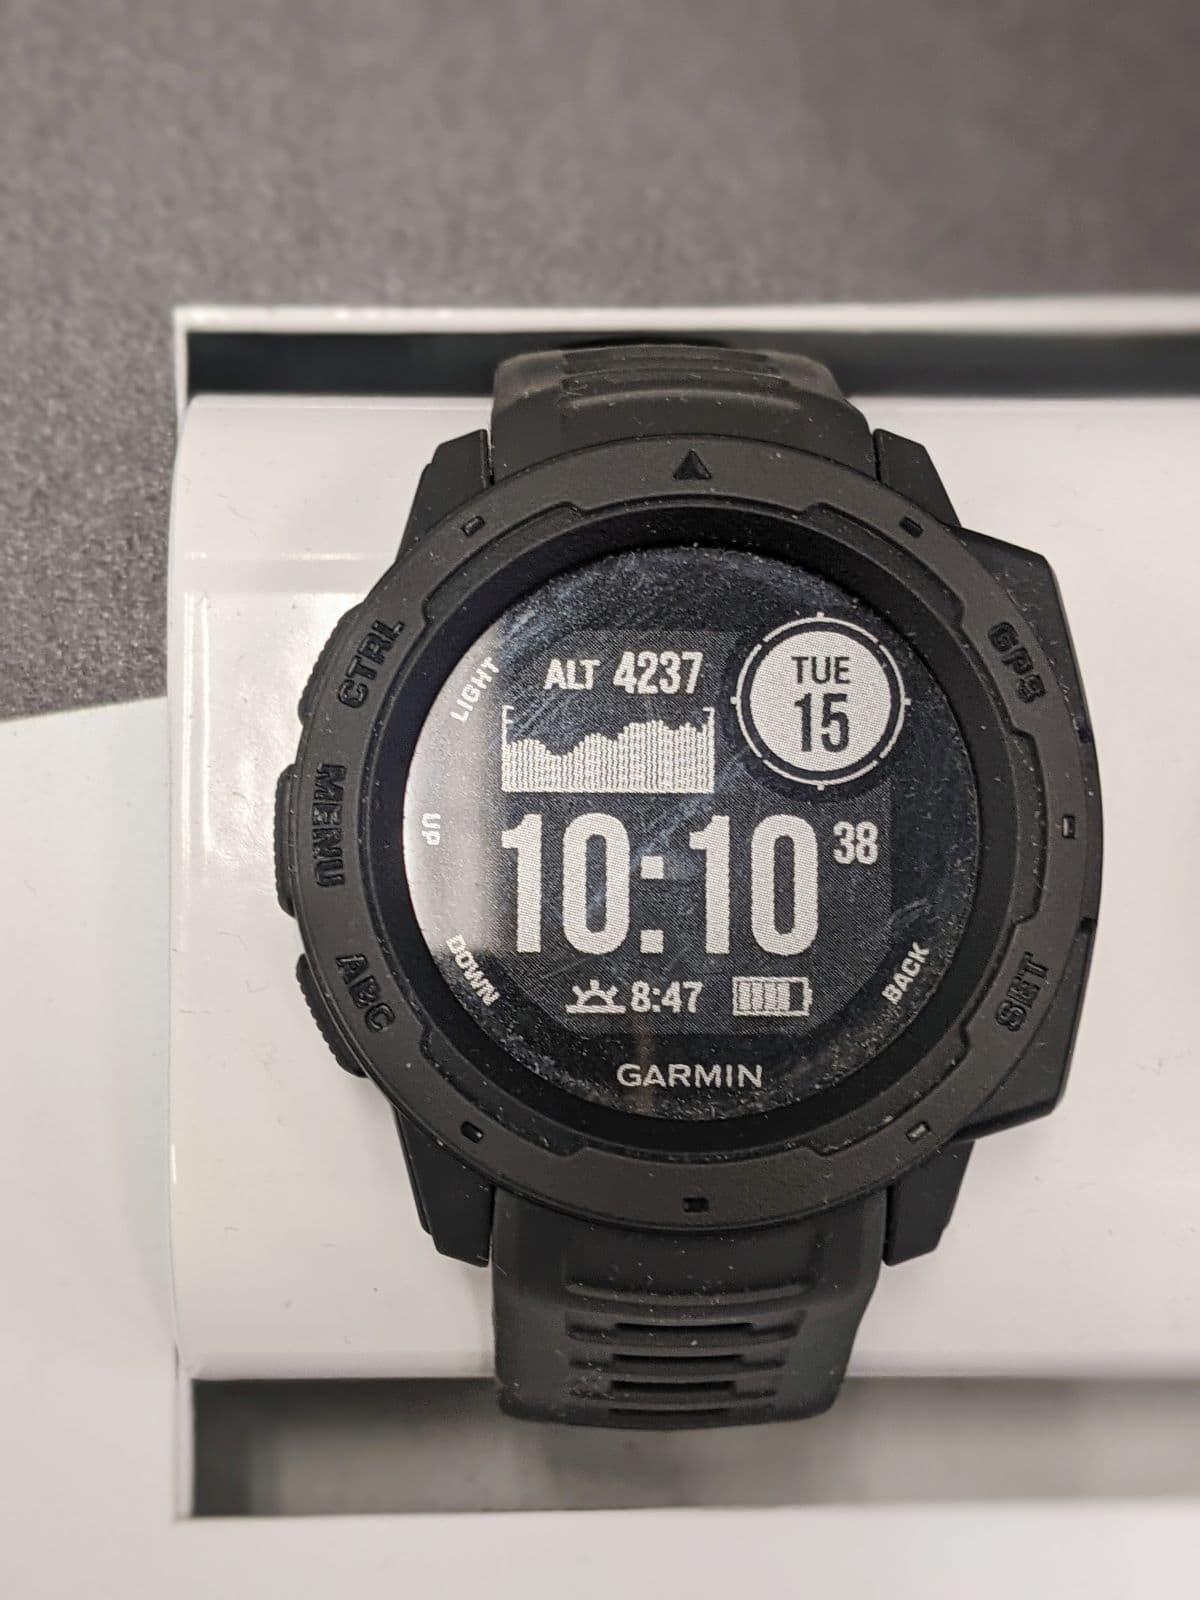 watch face of the standard Garmin Instinct in black